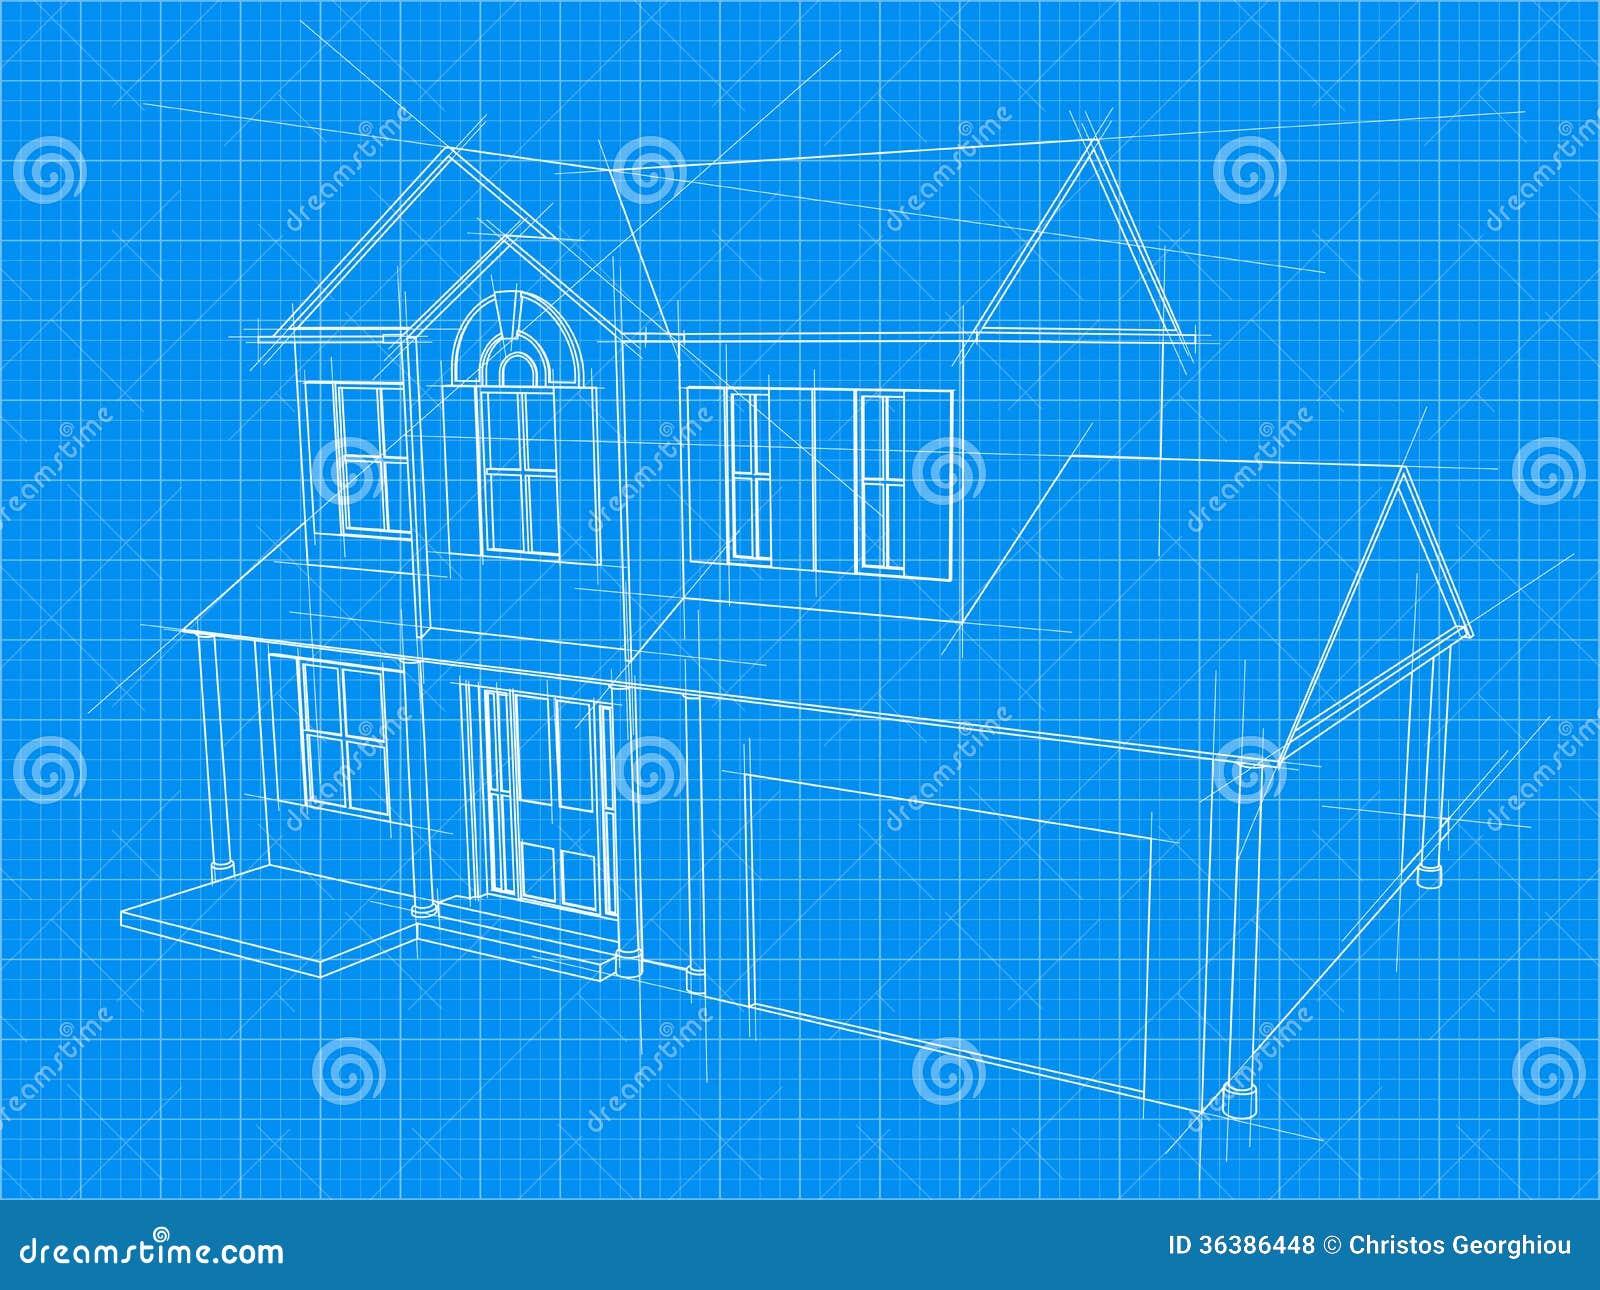 Wondrous House Blueprint Royalty Free Stock Photos Image 36386448 Largest Home Design Picture Inspirations Pitcheantrous